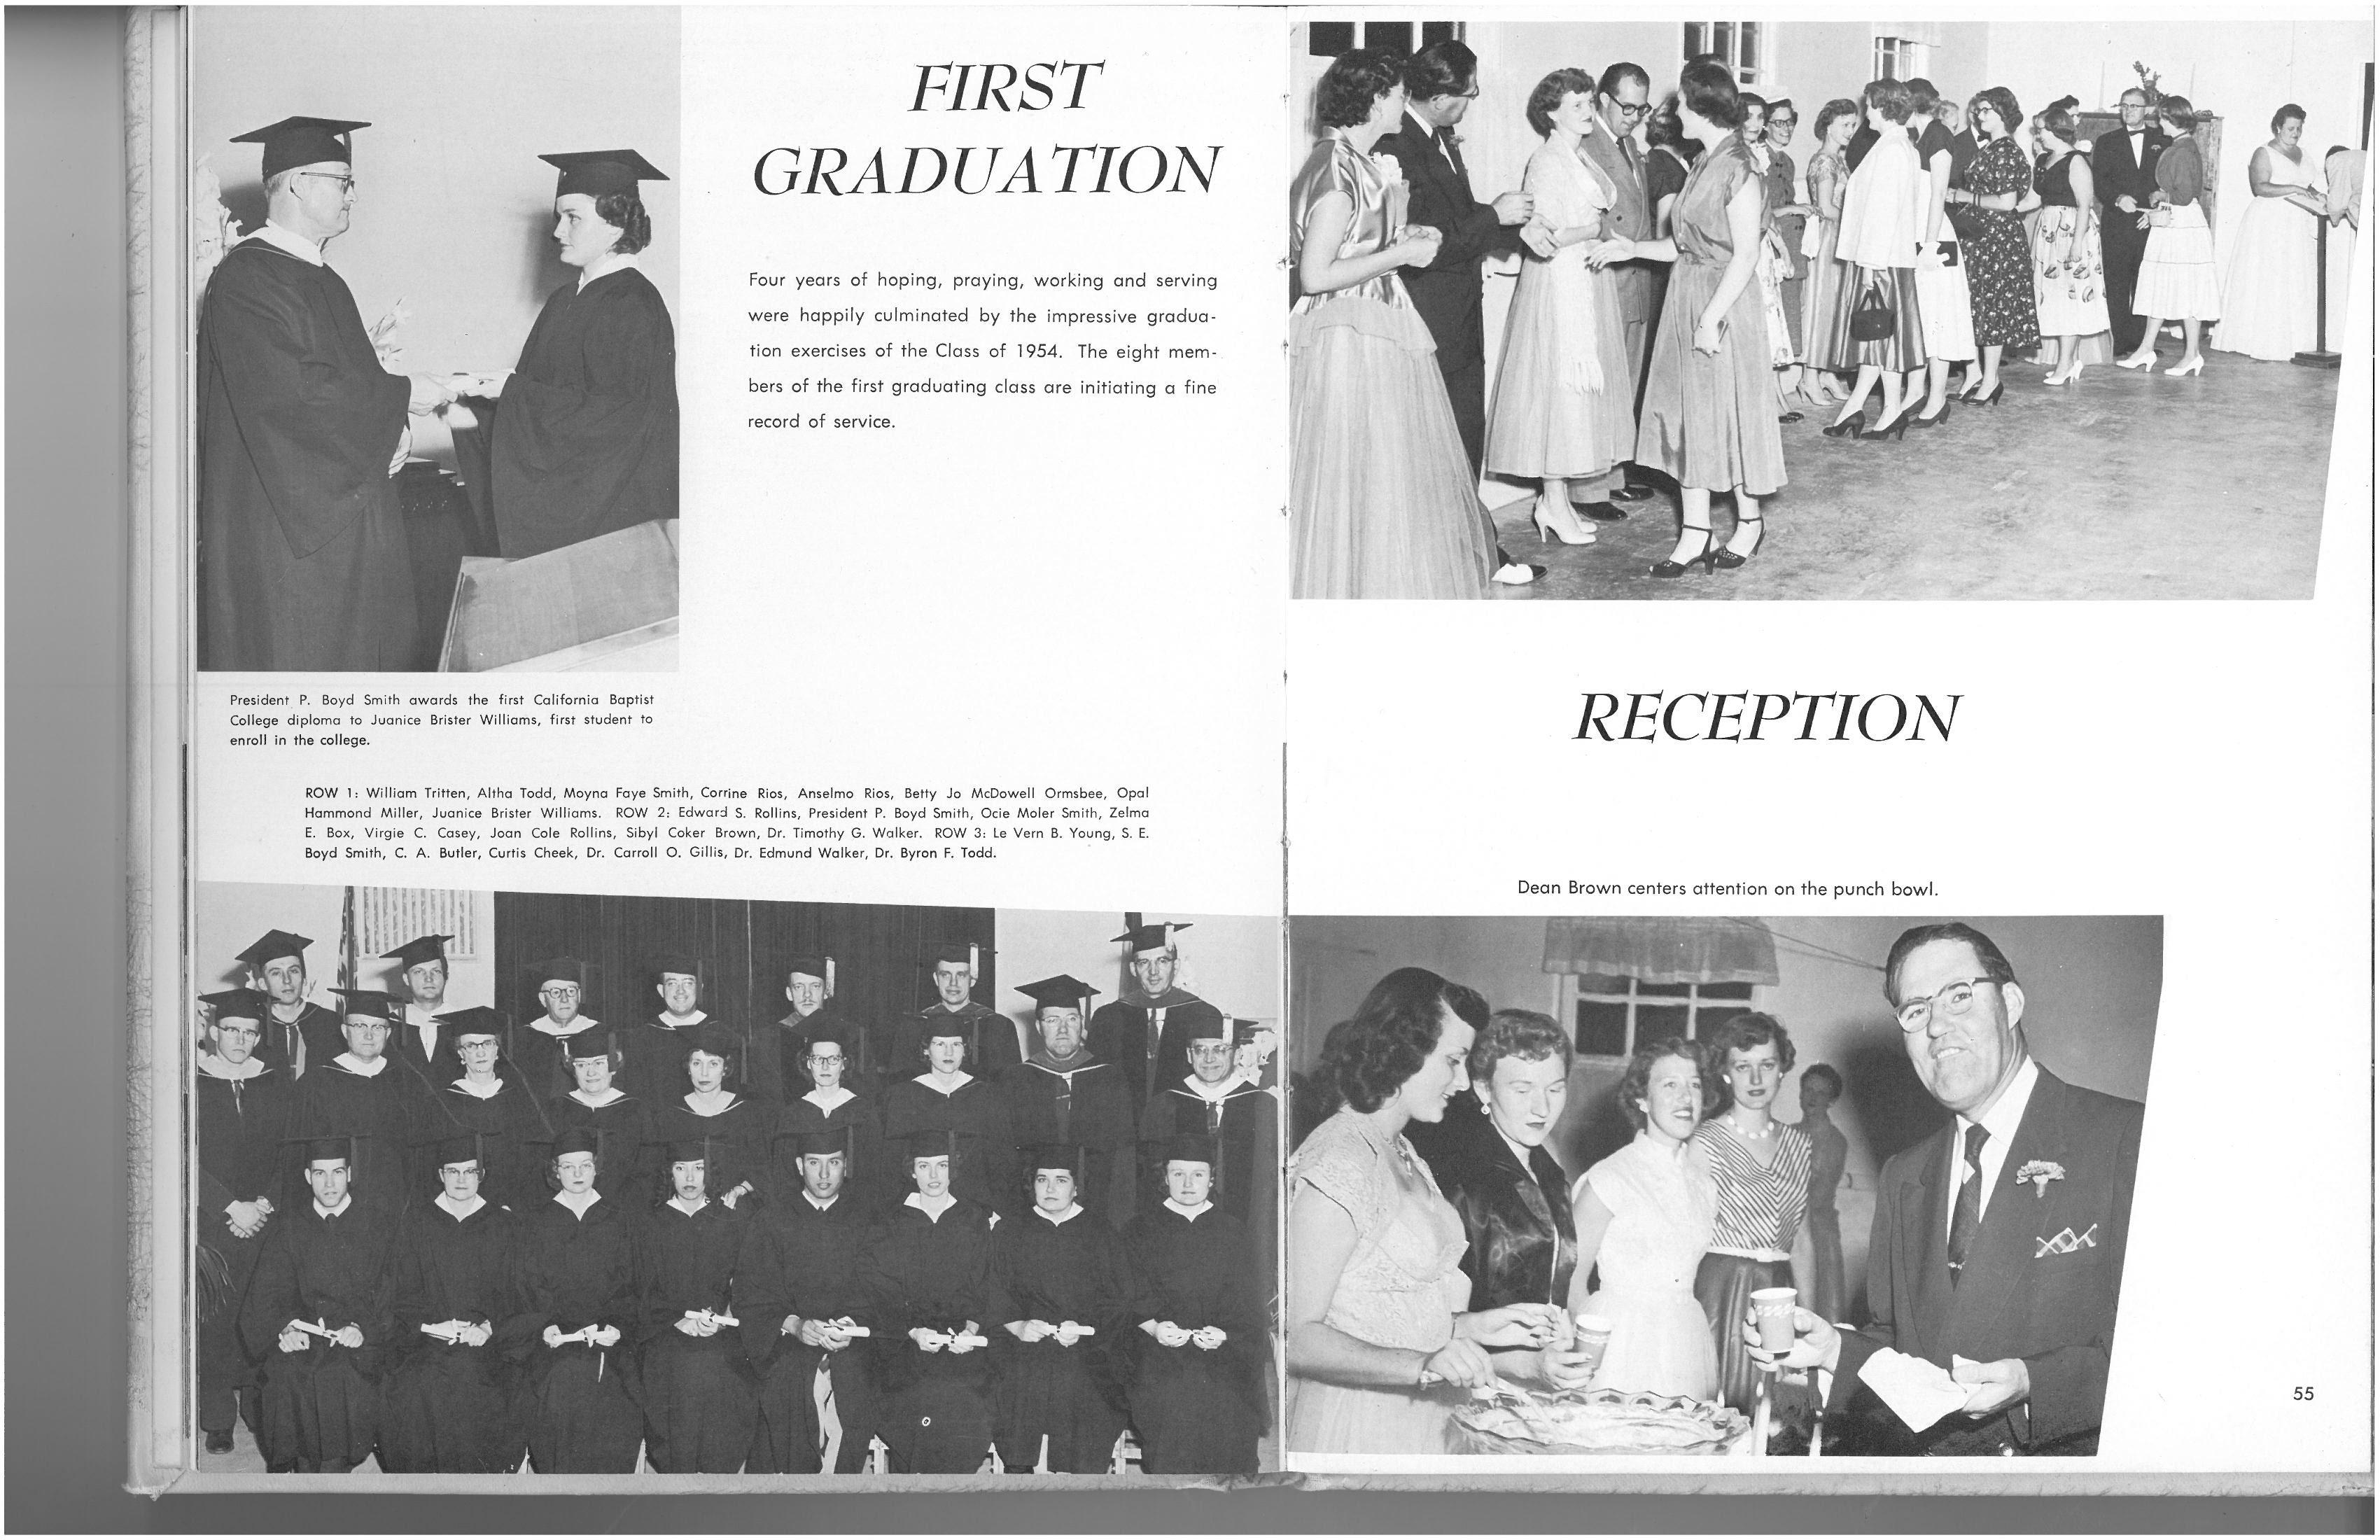 1955 - CBC's First Graduation!!!